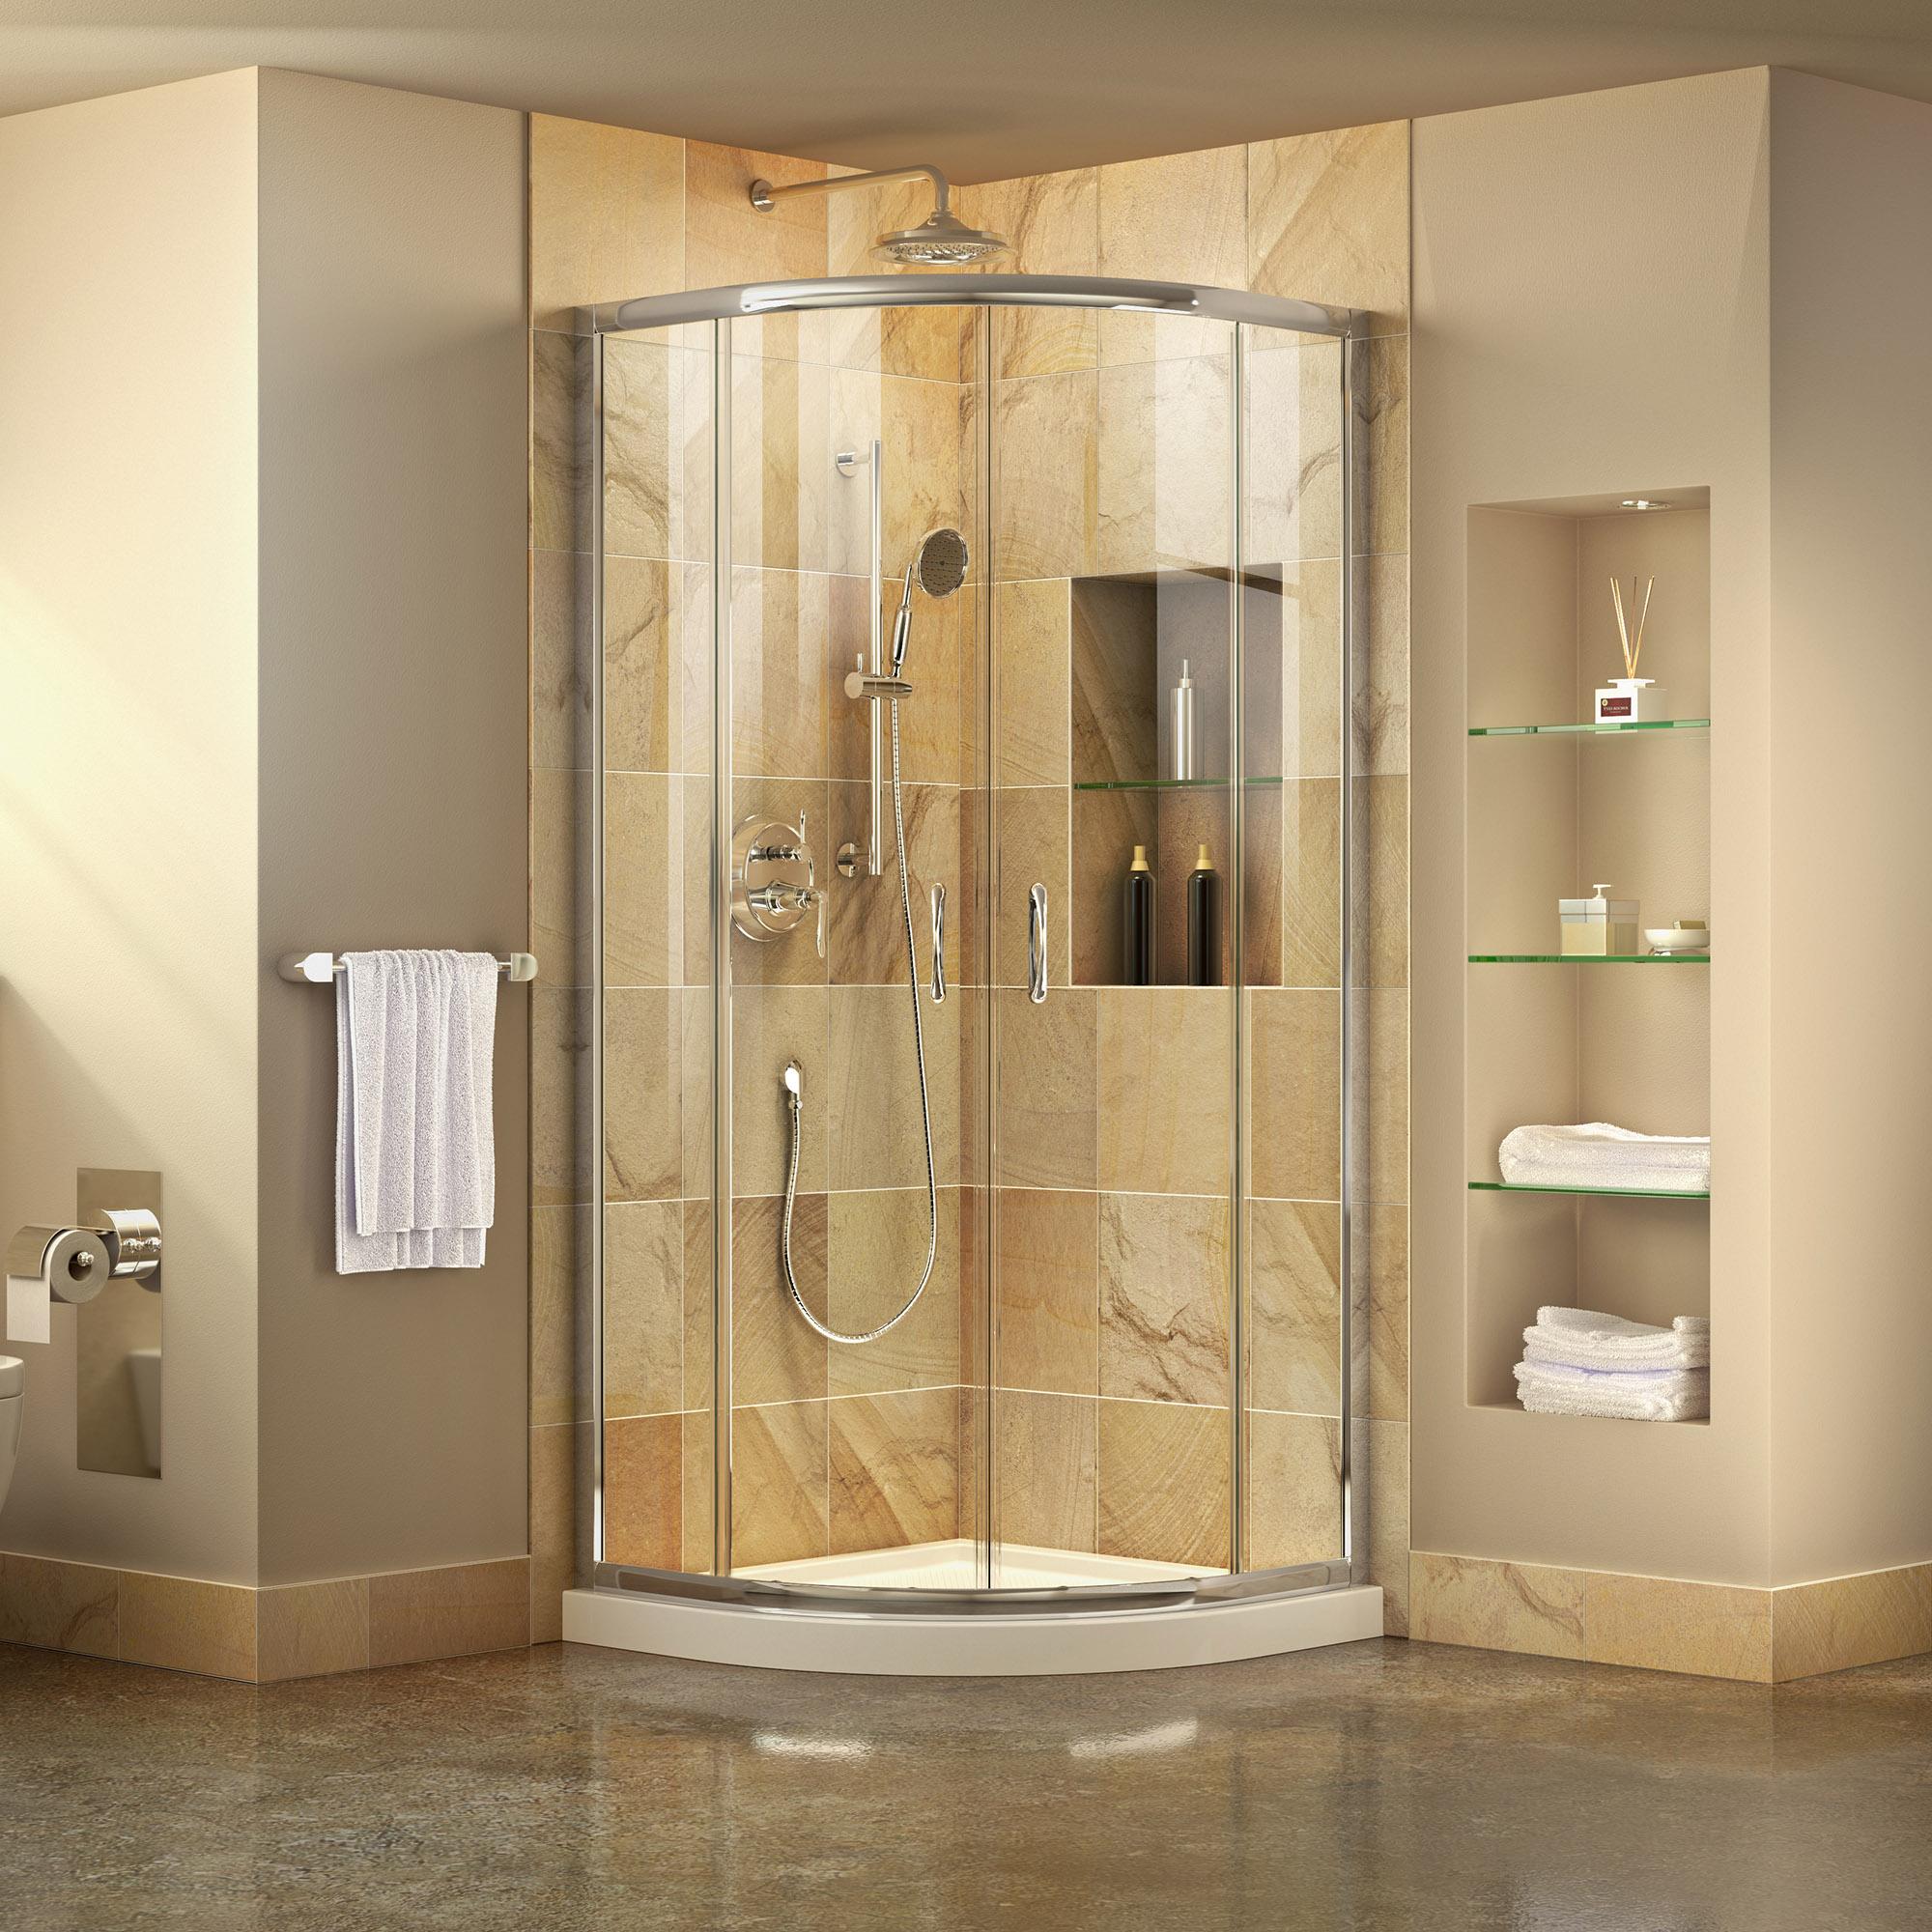 "Prime 36 3/8"" by 36 3/8"" Frameless Sliding Shower Enclosure, Base & QWALL-4 Shower Backwall Kit"